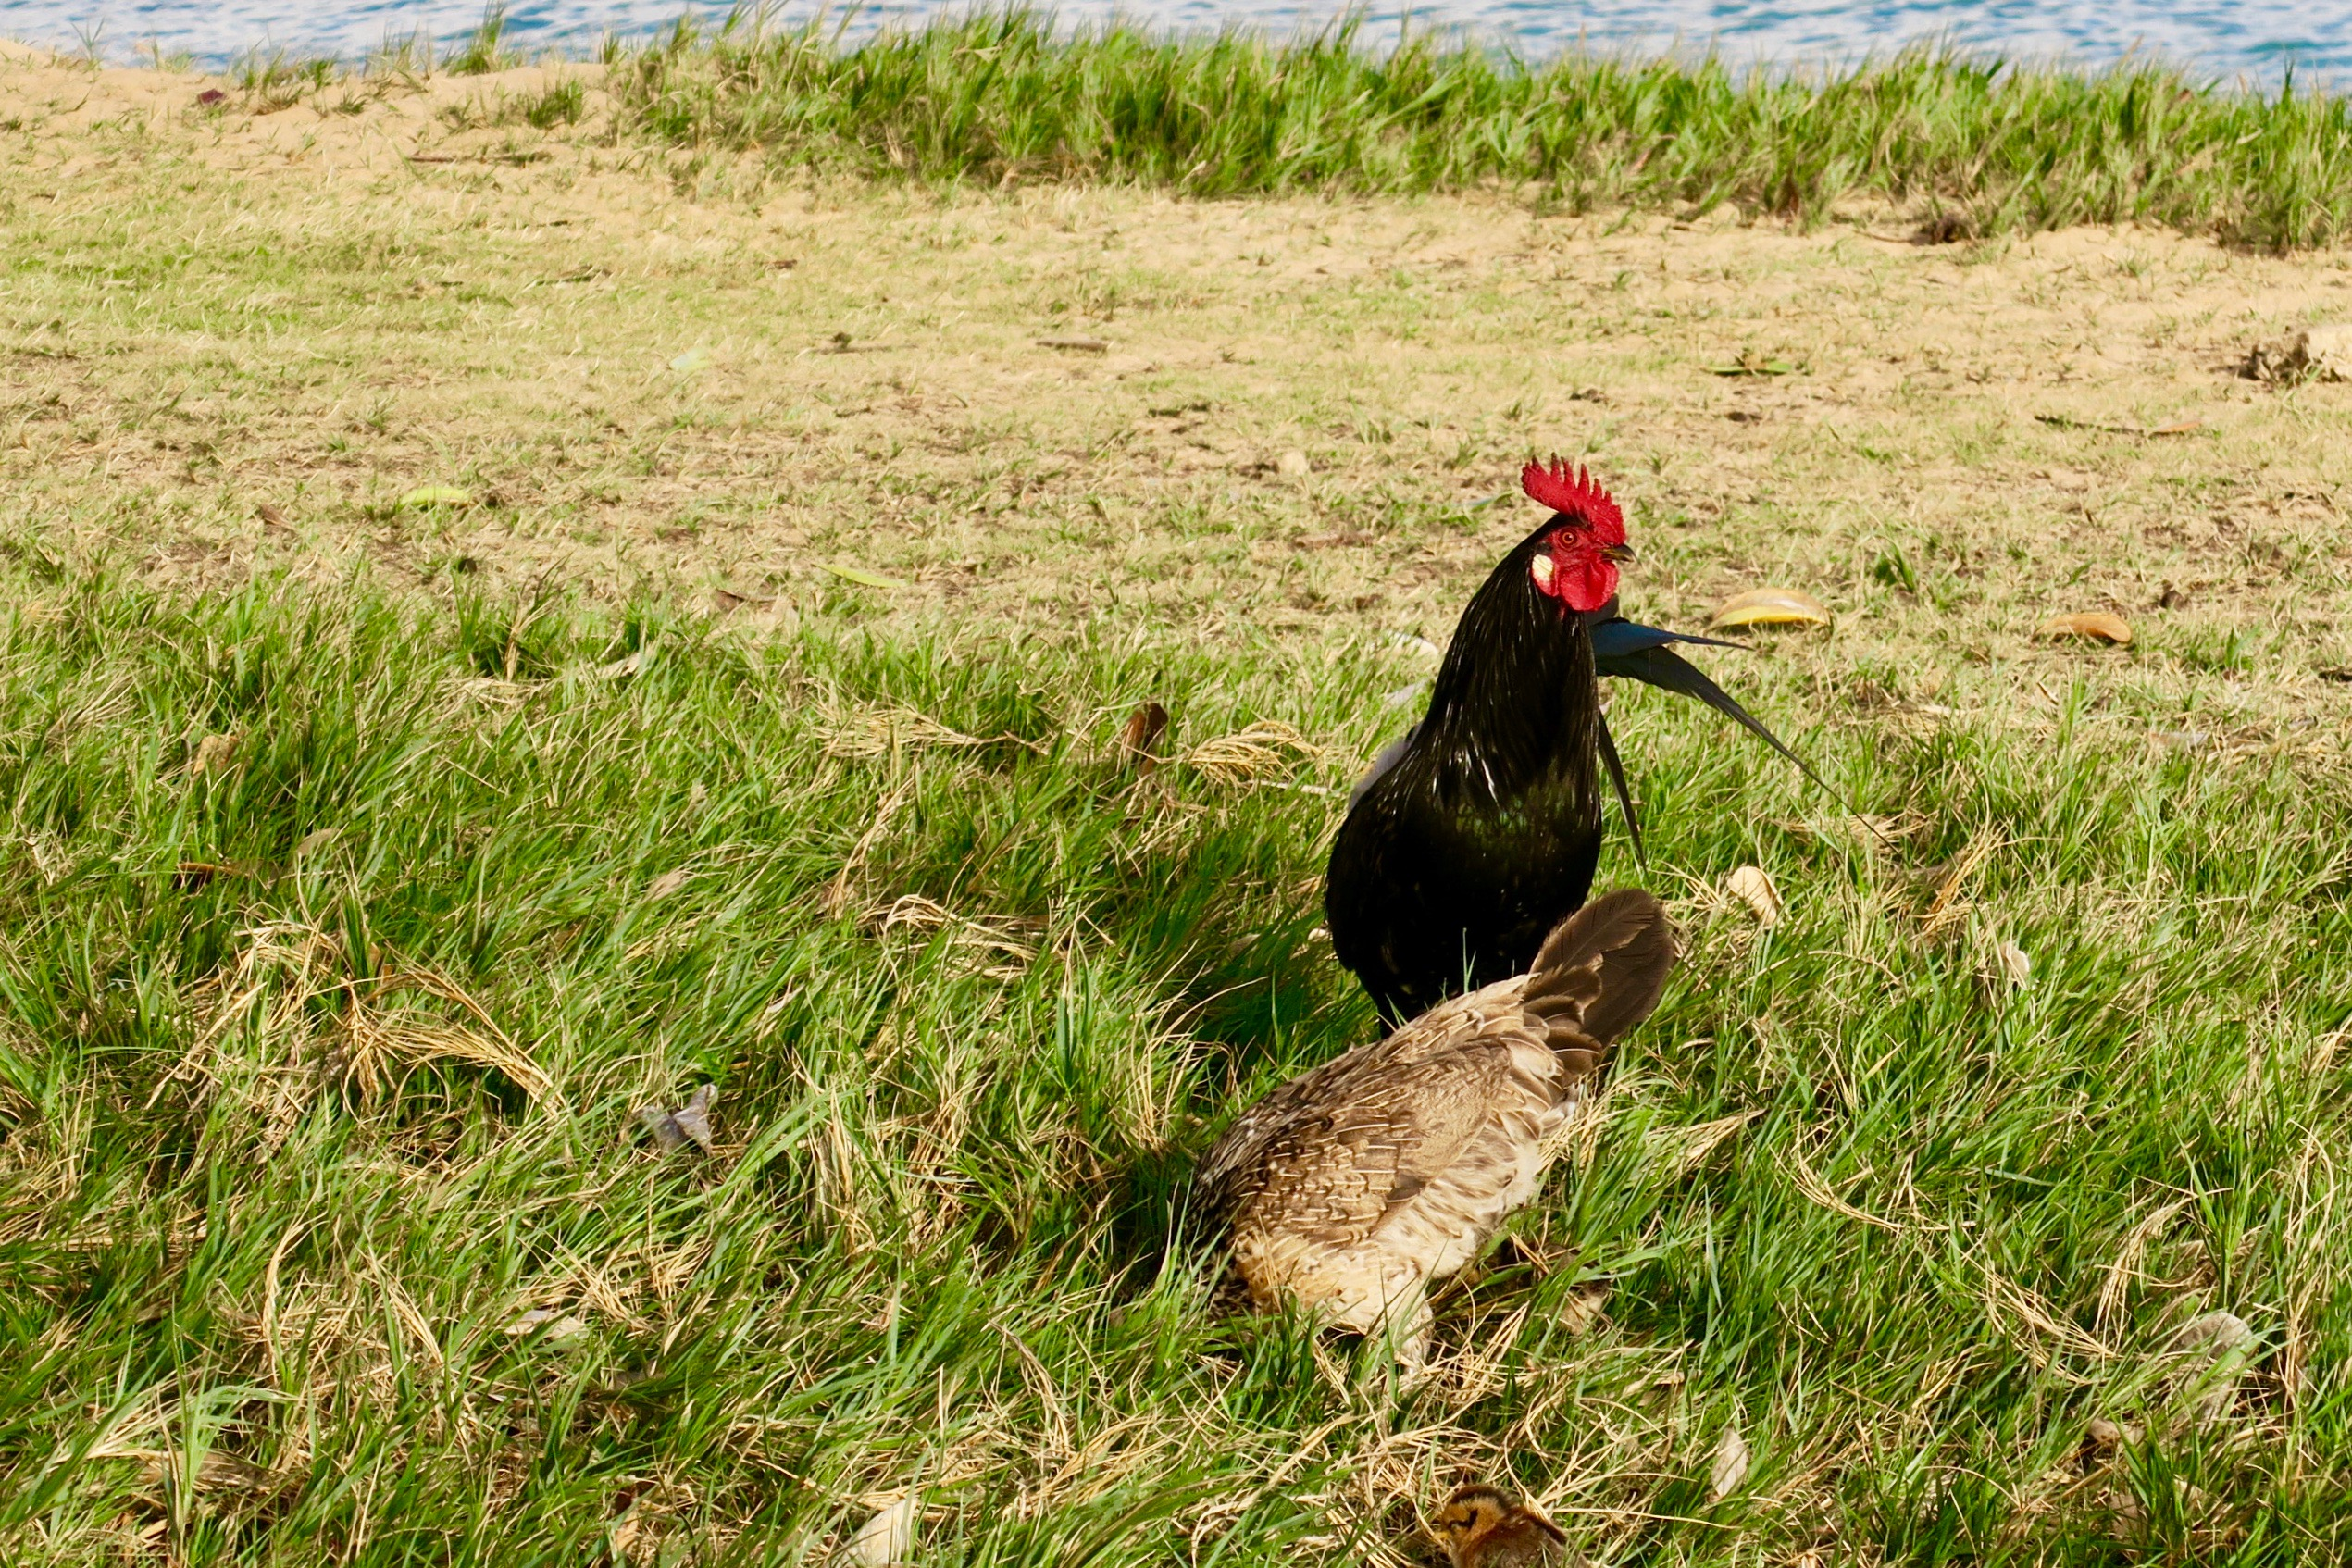 cock-and-hen-feeding-in-grass-by-ocean-kauai